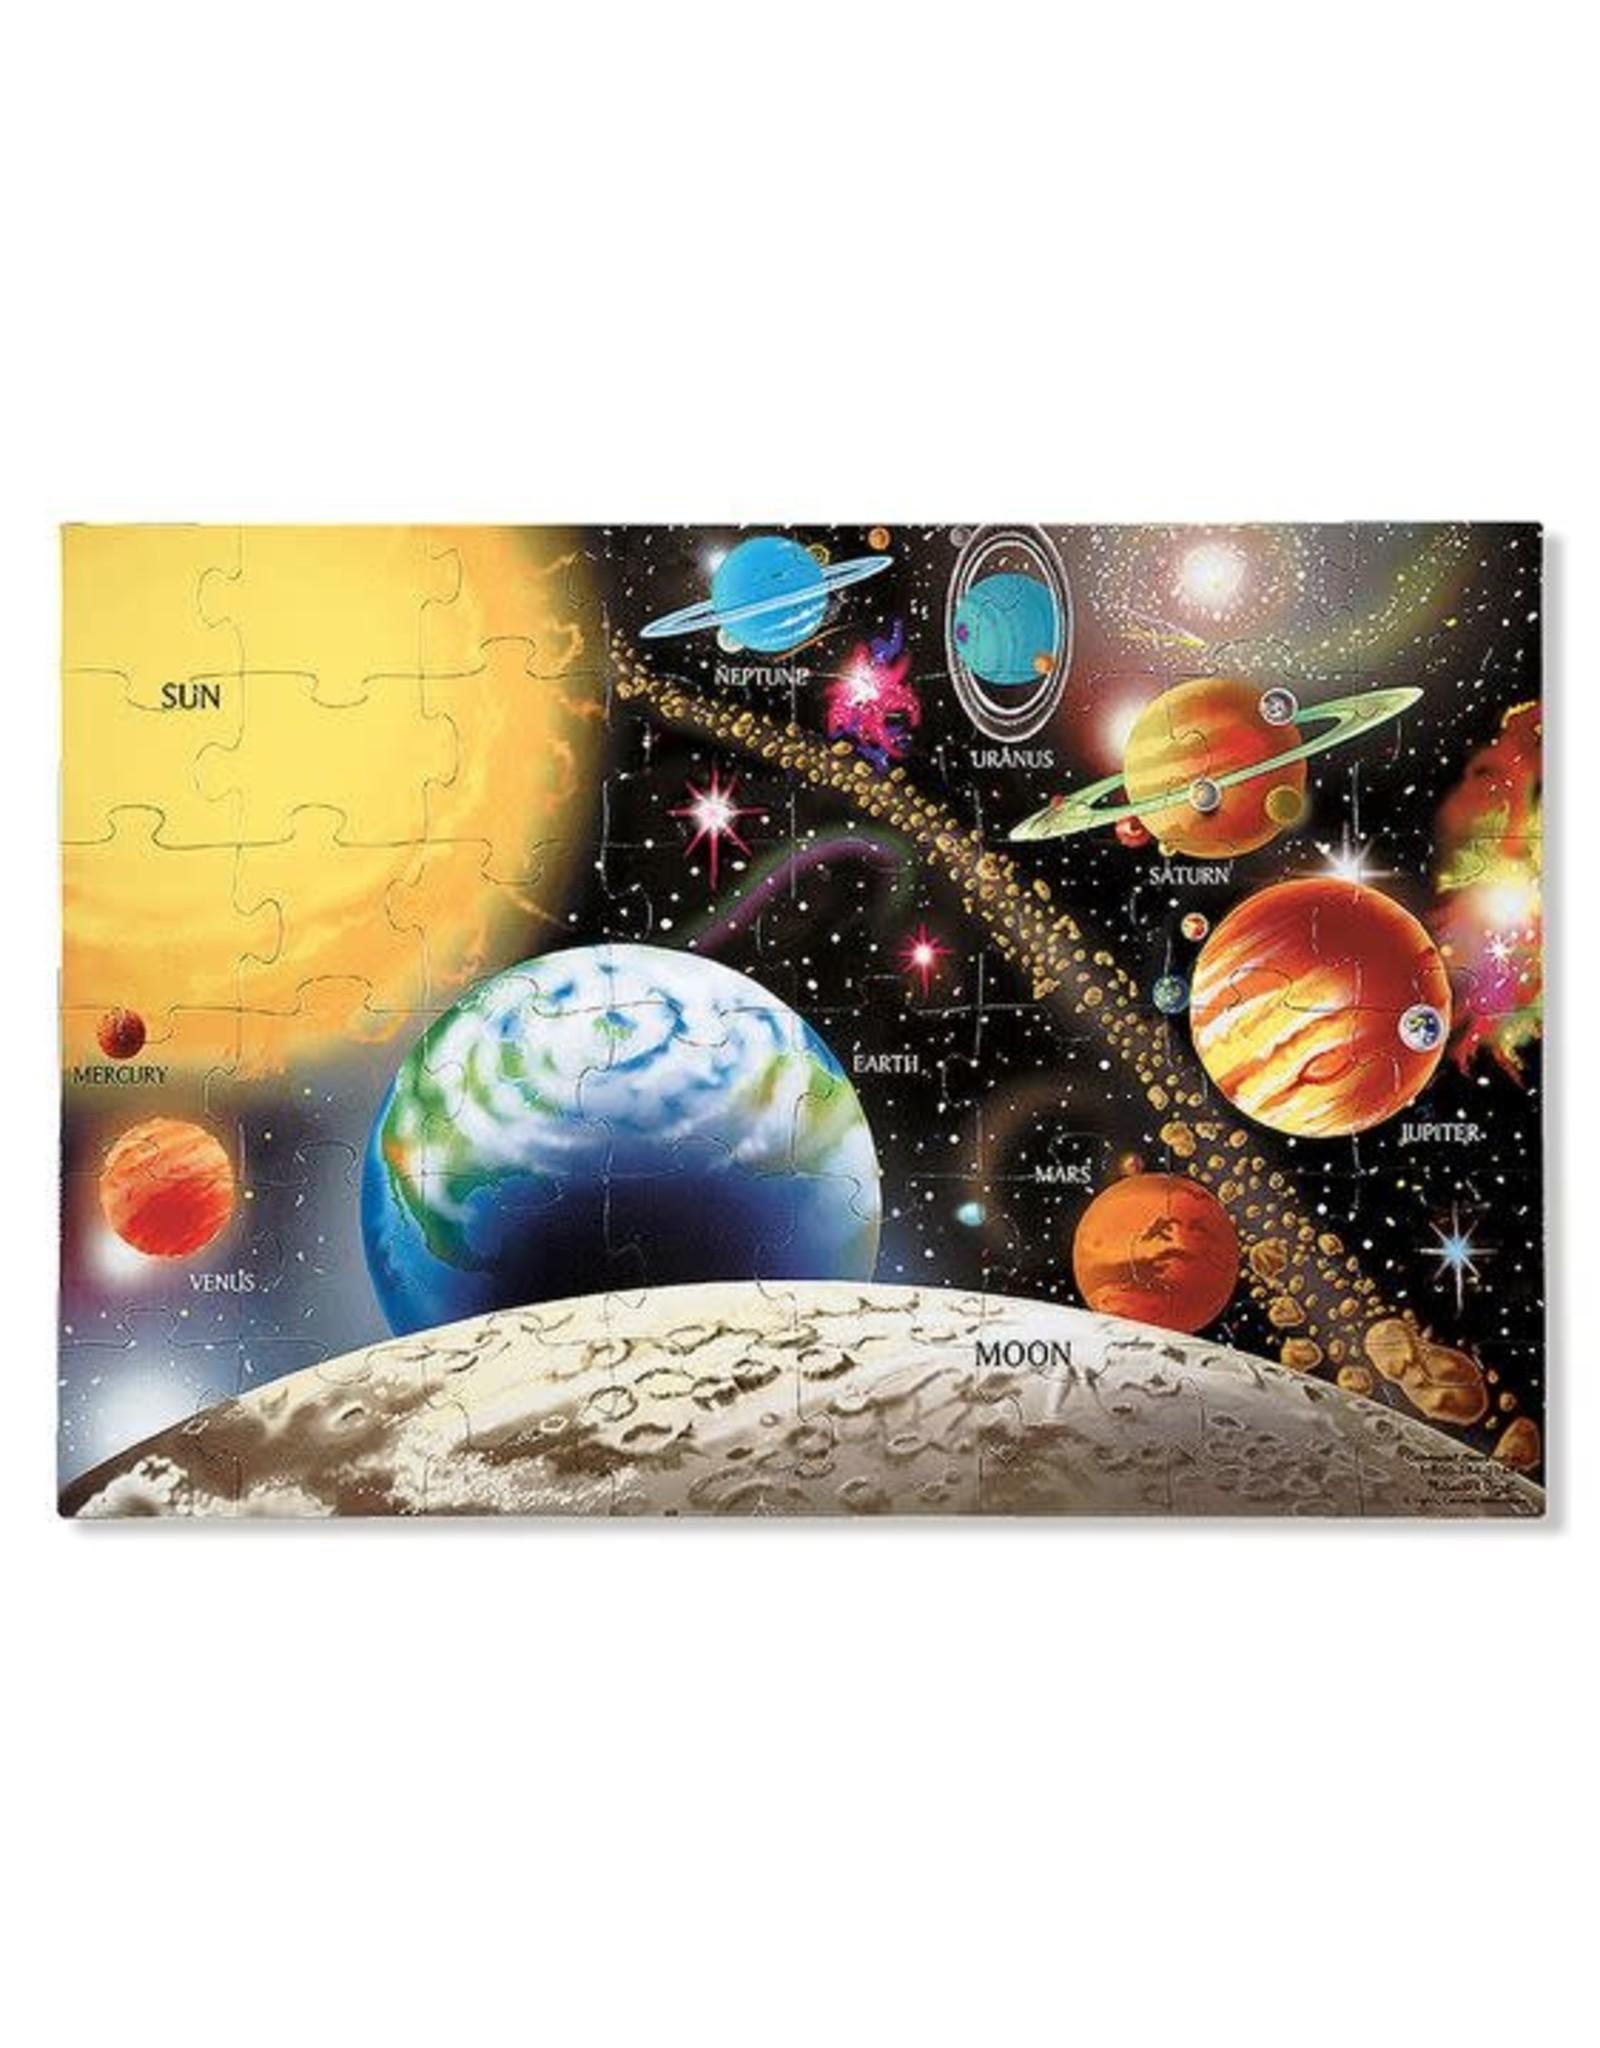 Melissa and Doug Solar System Floor 48-pc Floor Puzzle